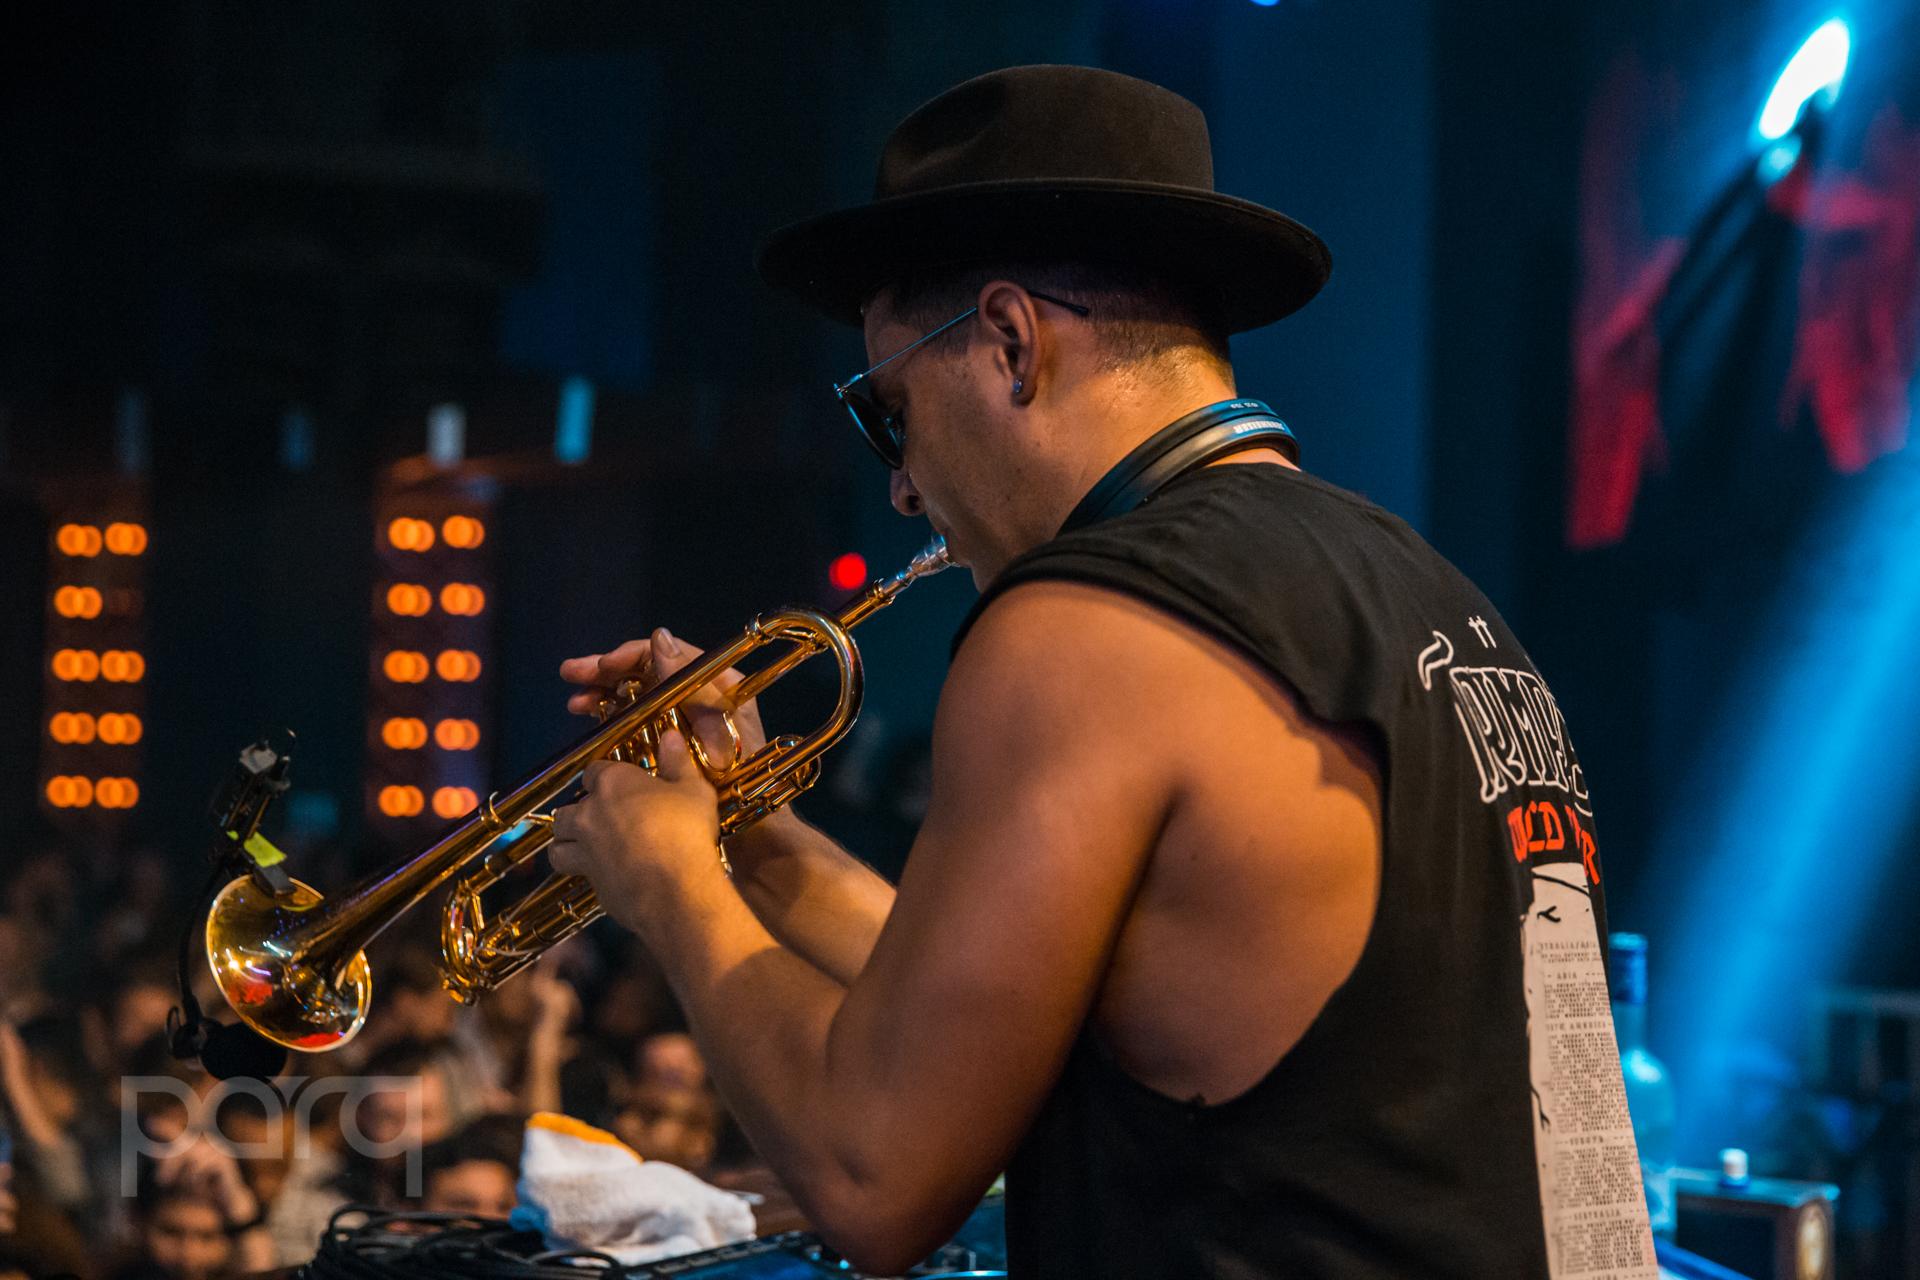 02.02.18 Parq - Timmy Trumpet-12.jpg